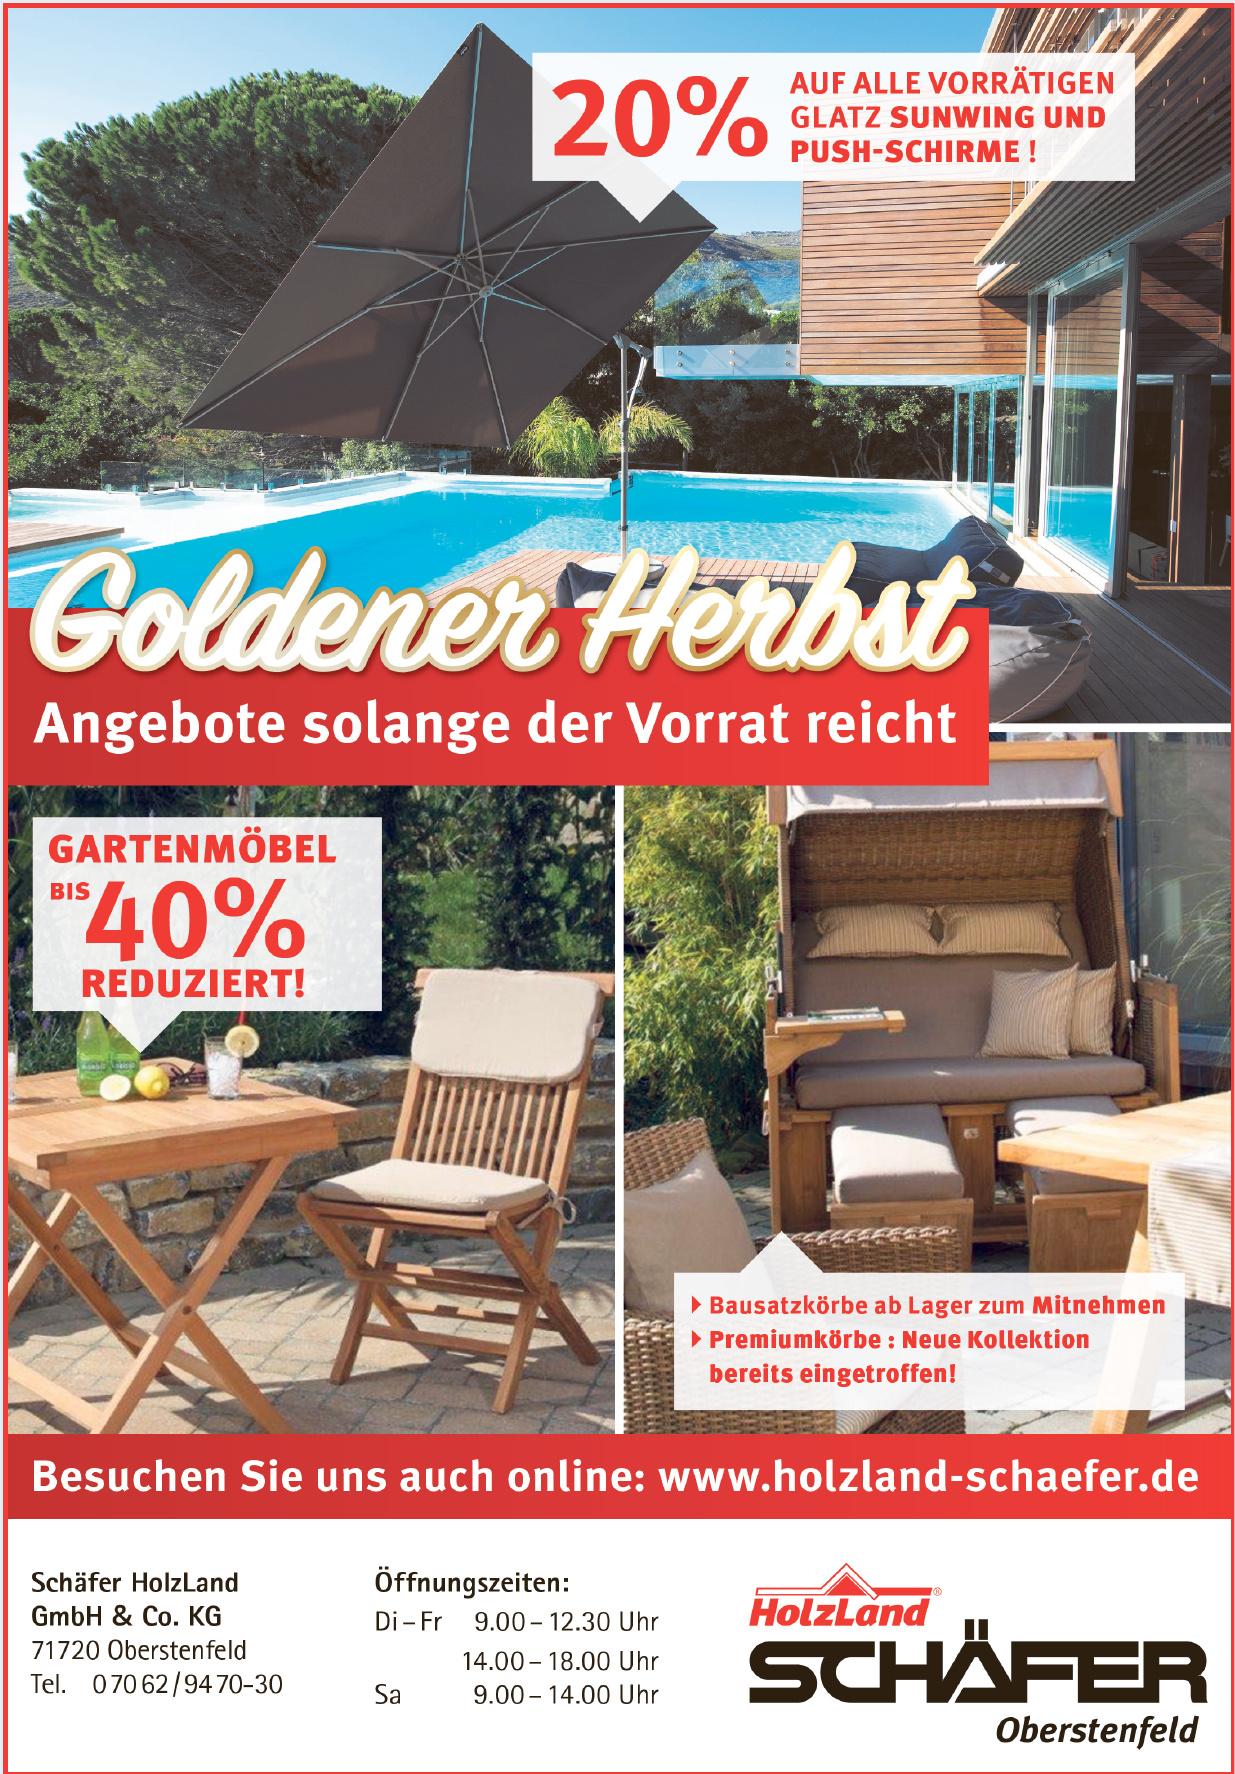 Schäfer HolzLand GmbH + Co. KG